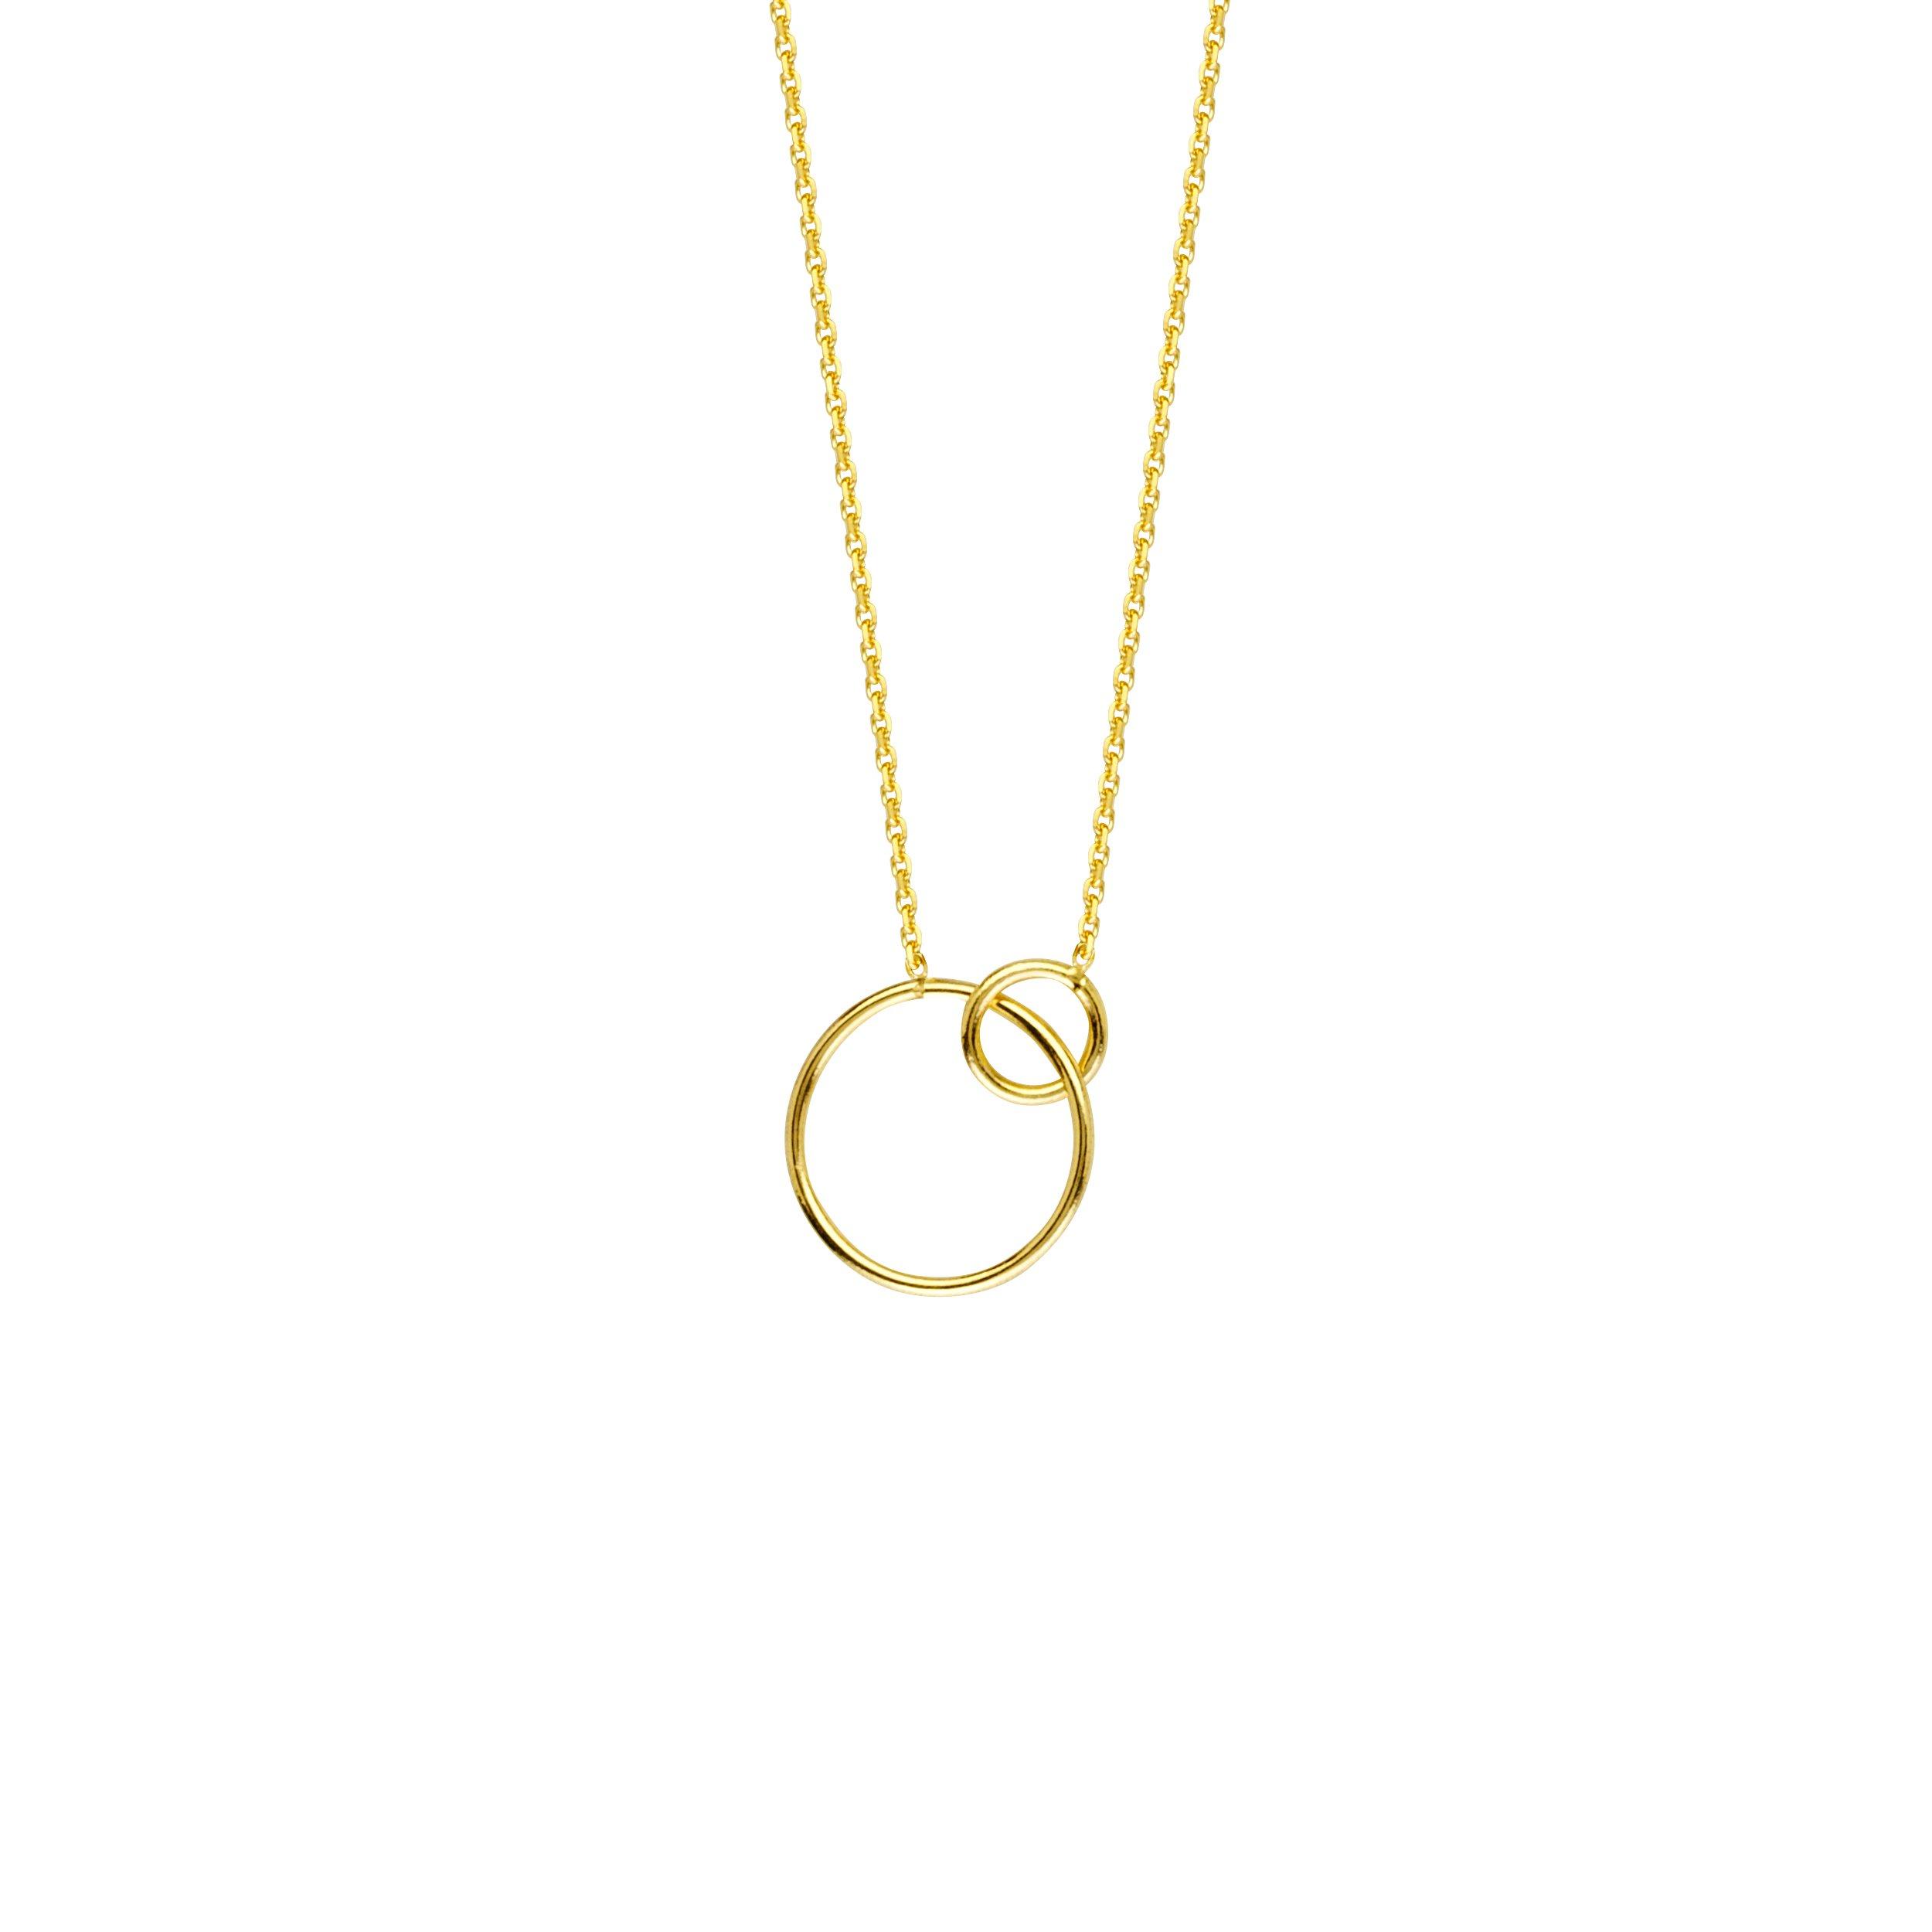 Gold Necklace, Interlocking Rings Adjustable. Necklace 5M Sr by DiamondJewelryNY (Image #1)